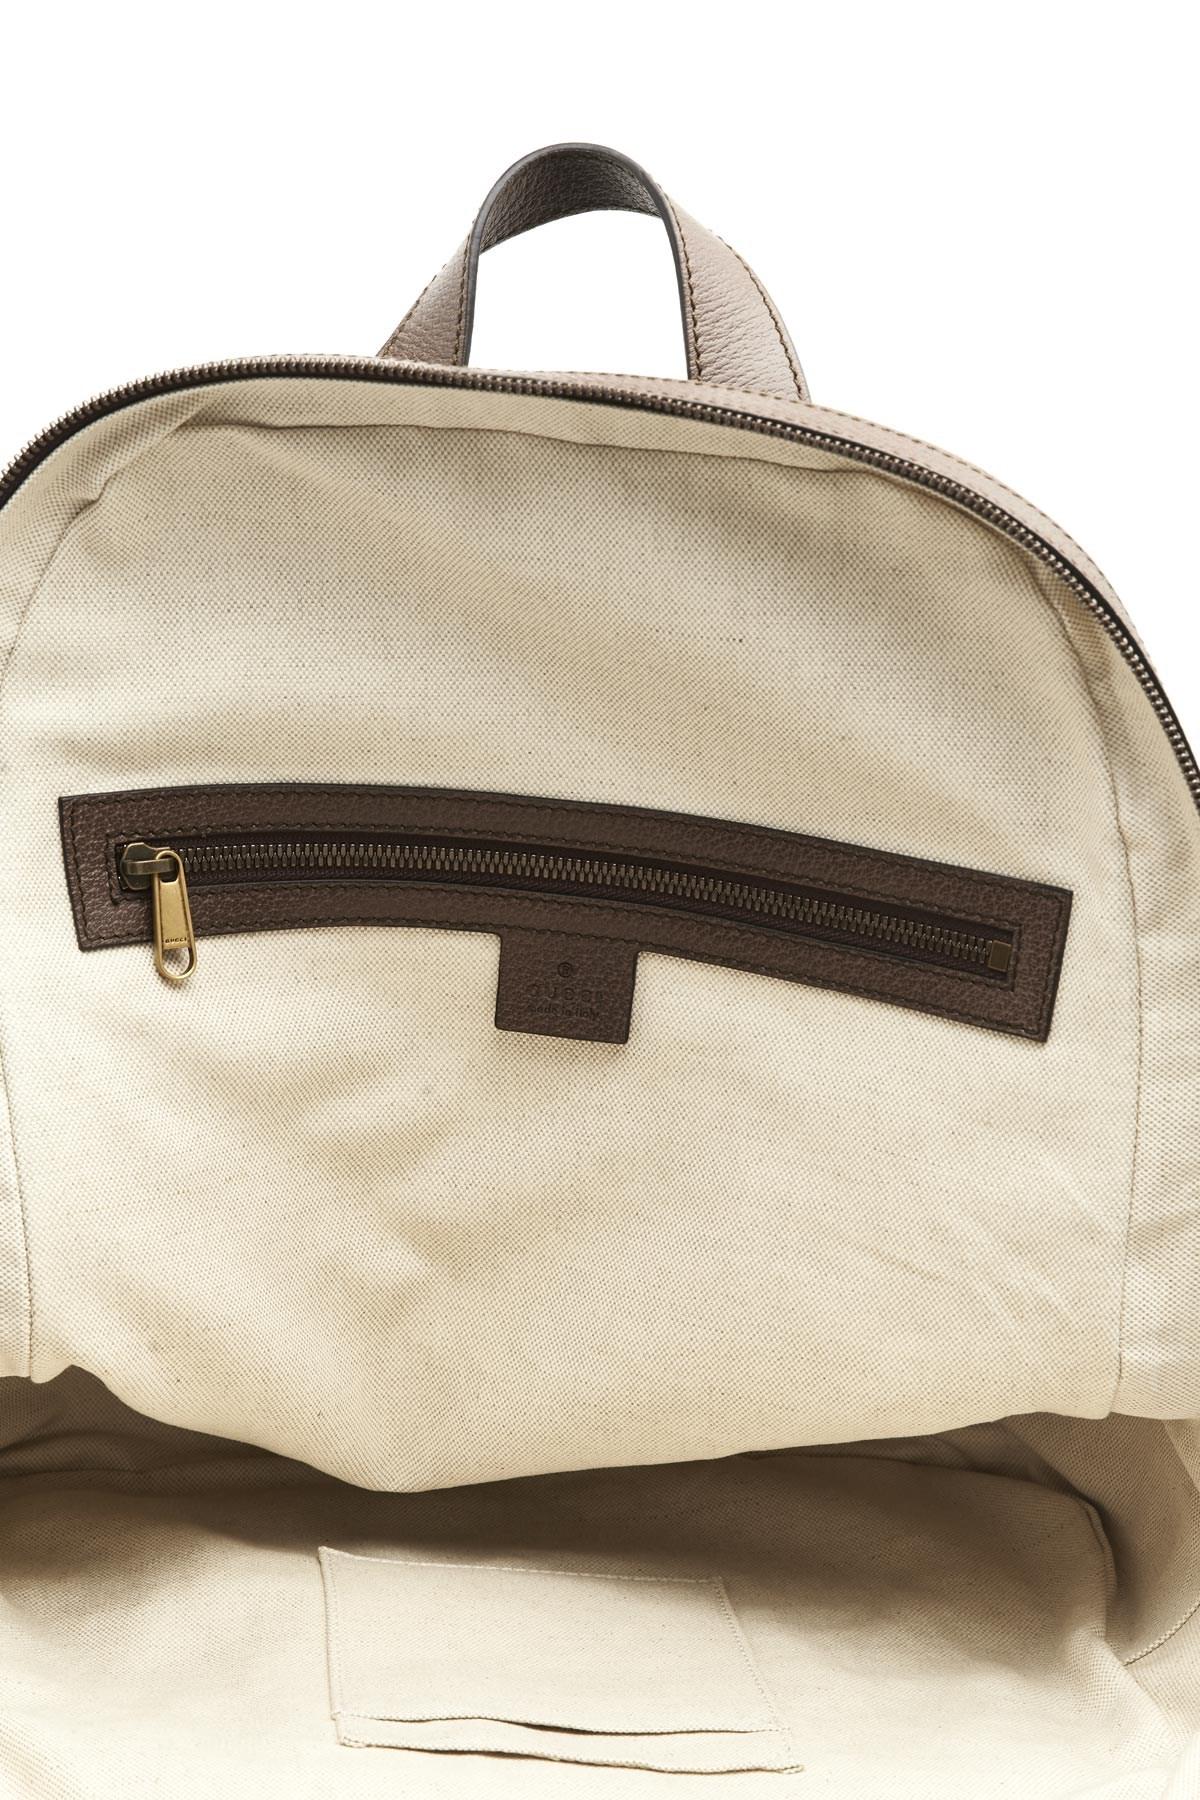 gucci  GG supreme  backpack available on julian-fashion.com - 62379 3f16b93d73de4